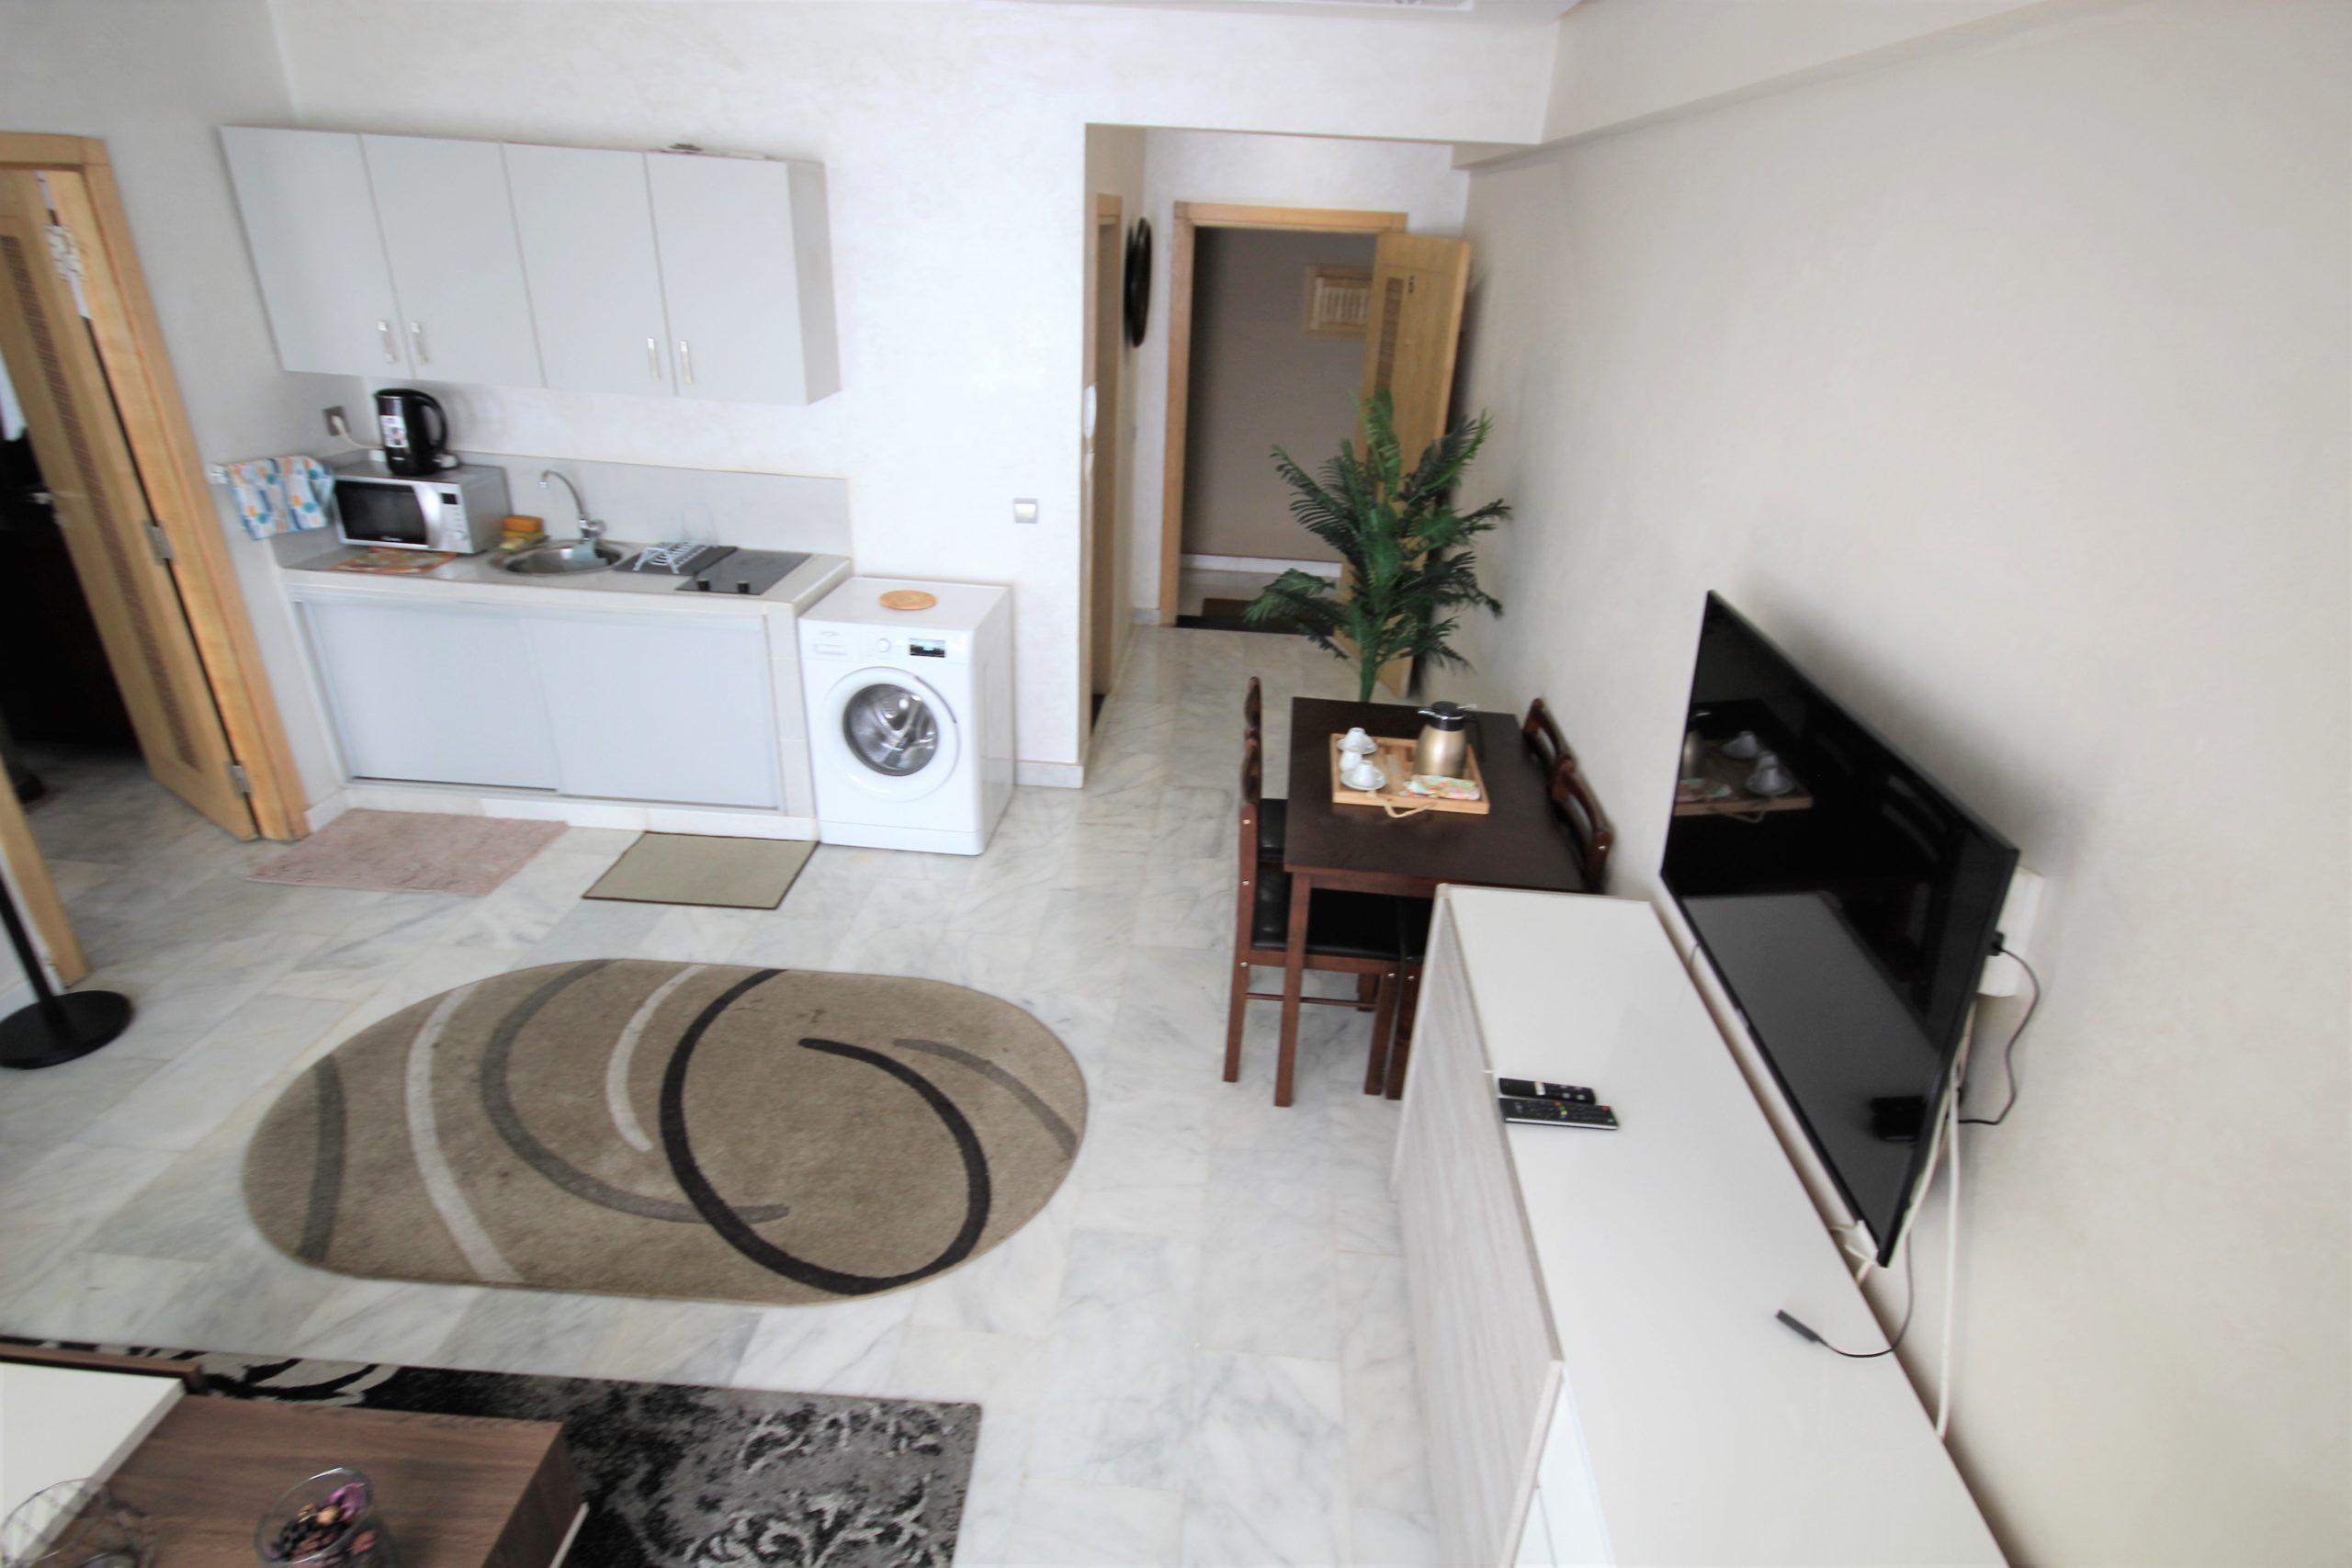 Maroc, Casablanca, MAARIF centre loue studio neuf meublé